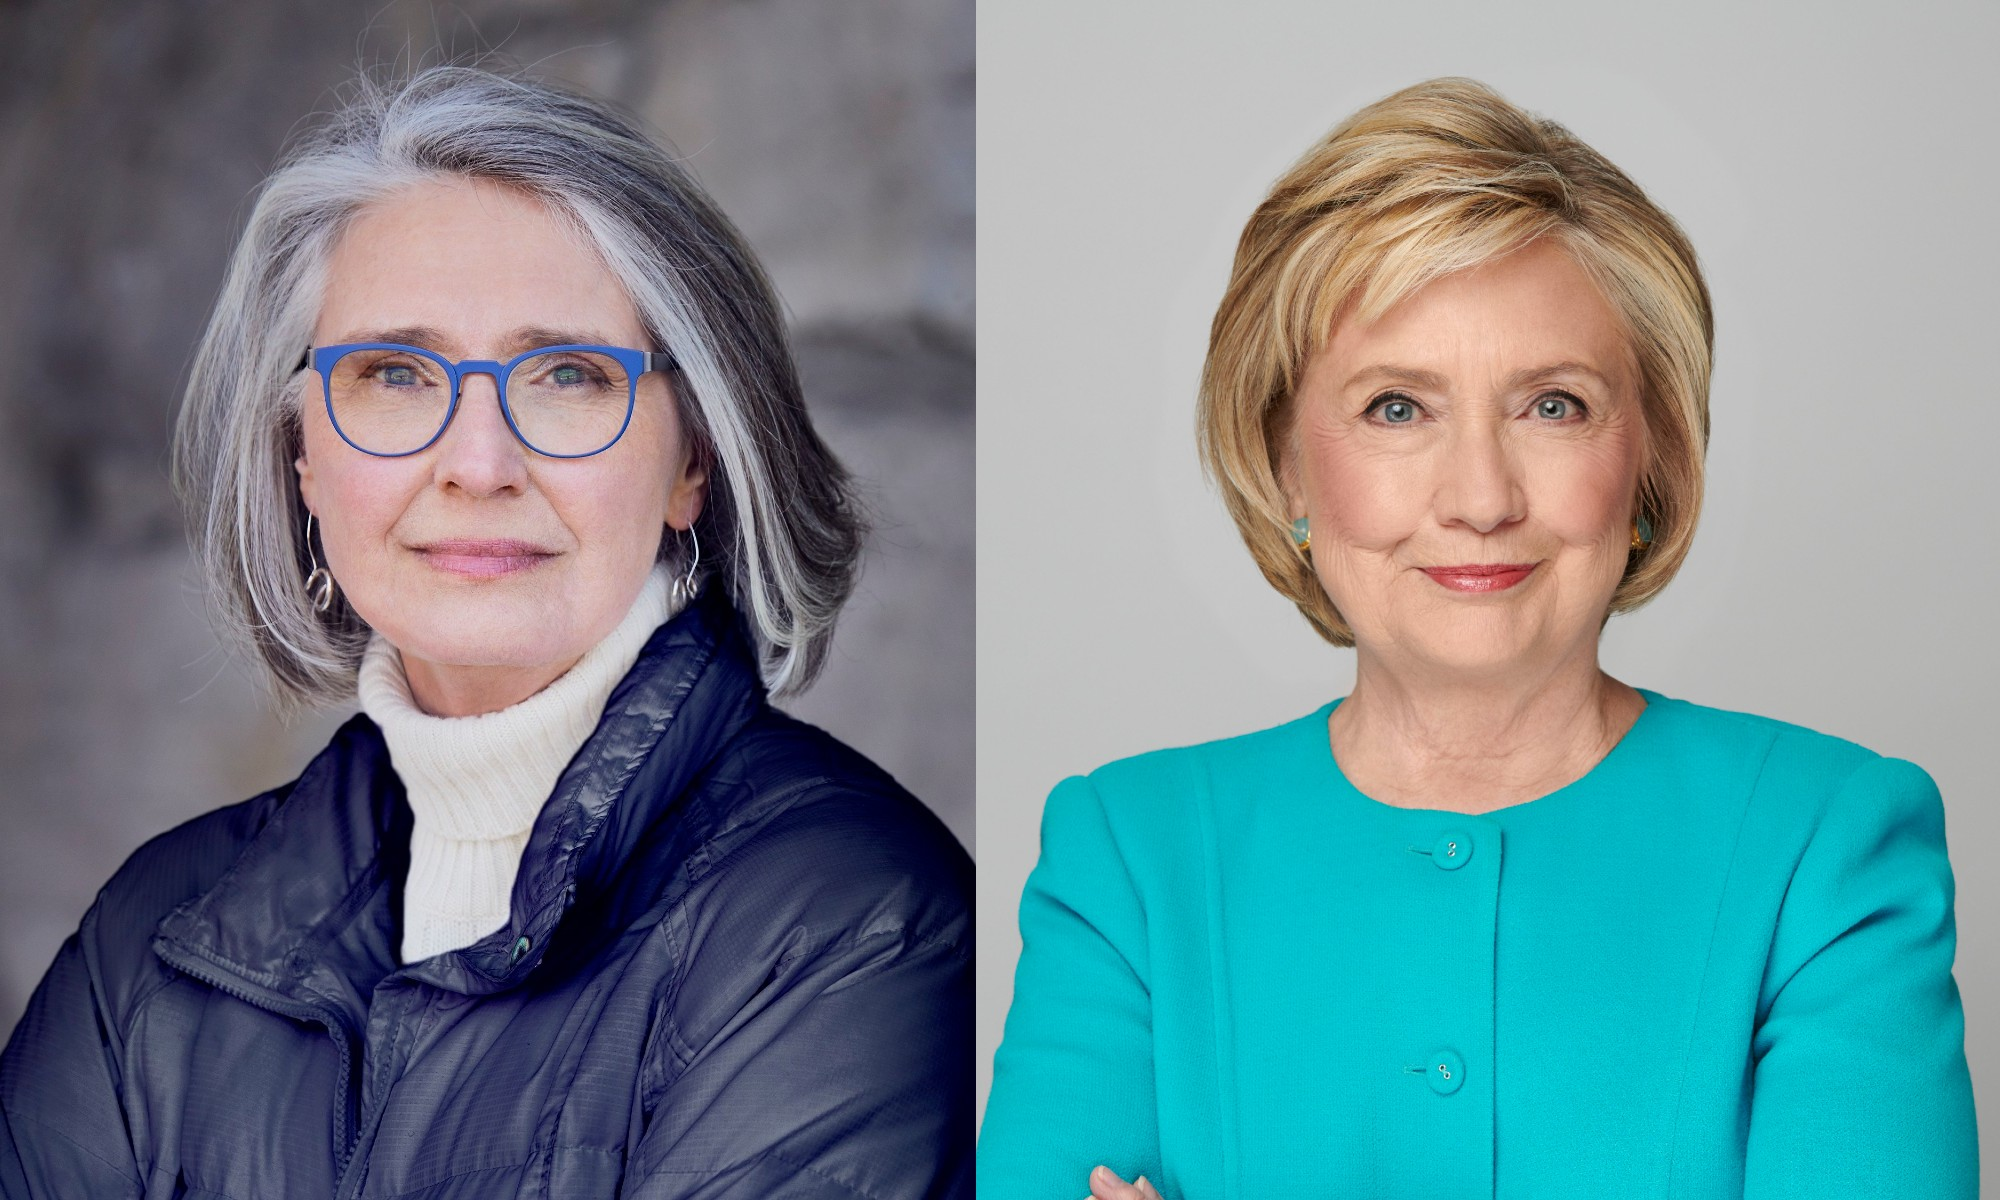 Headshots of Louise Penny and Hillary Clinton